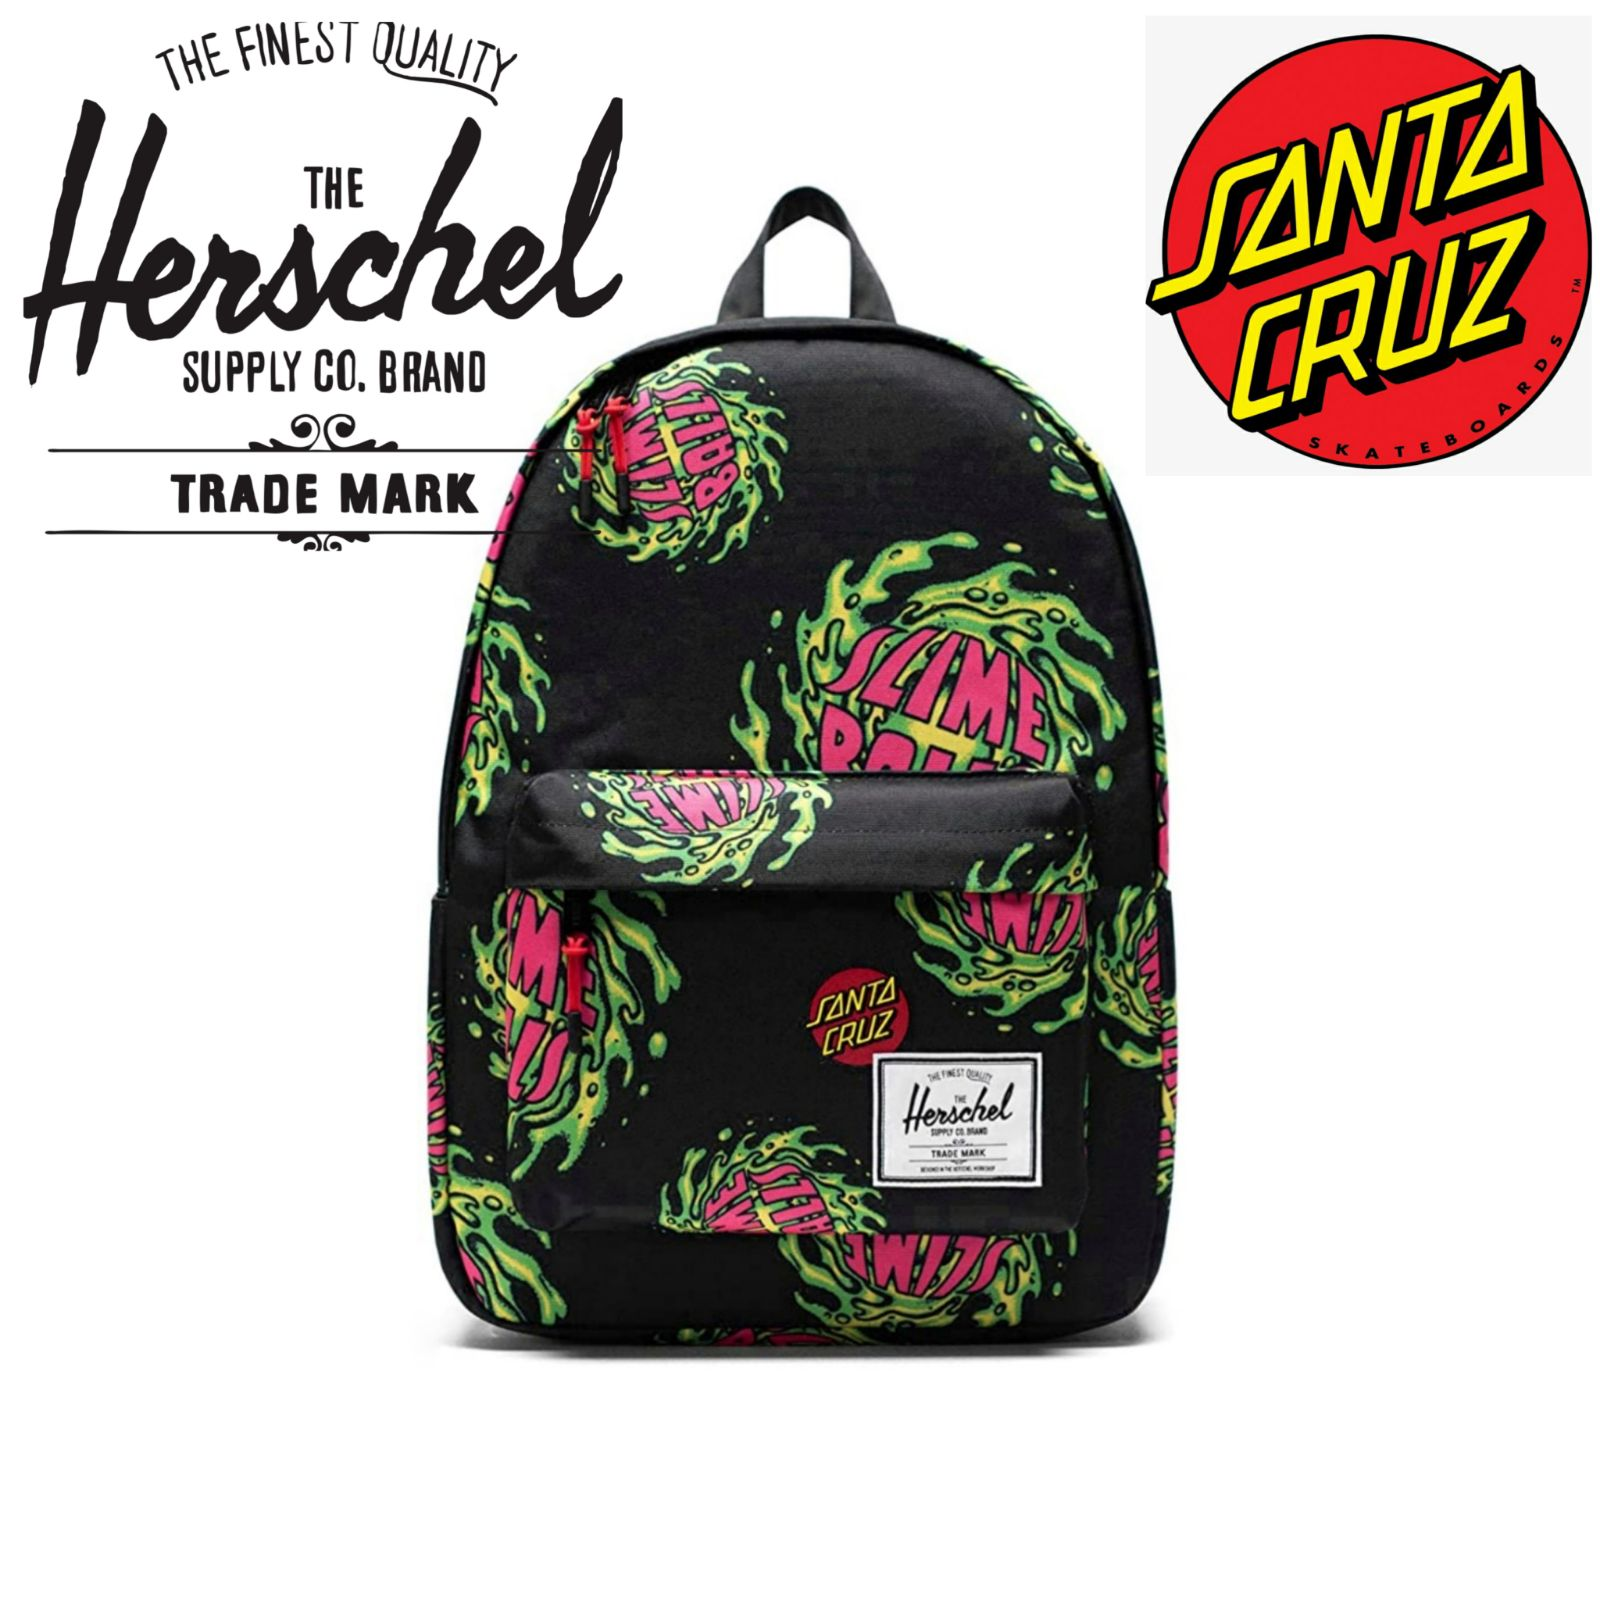 Herschel X Santa Cruz SLIMEBALL Backpack